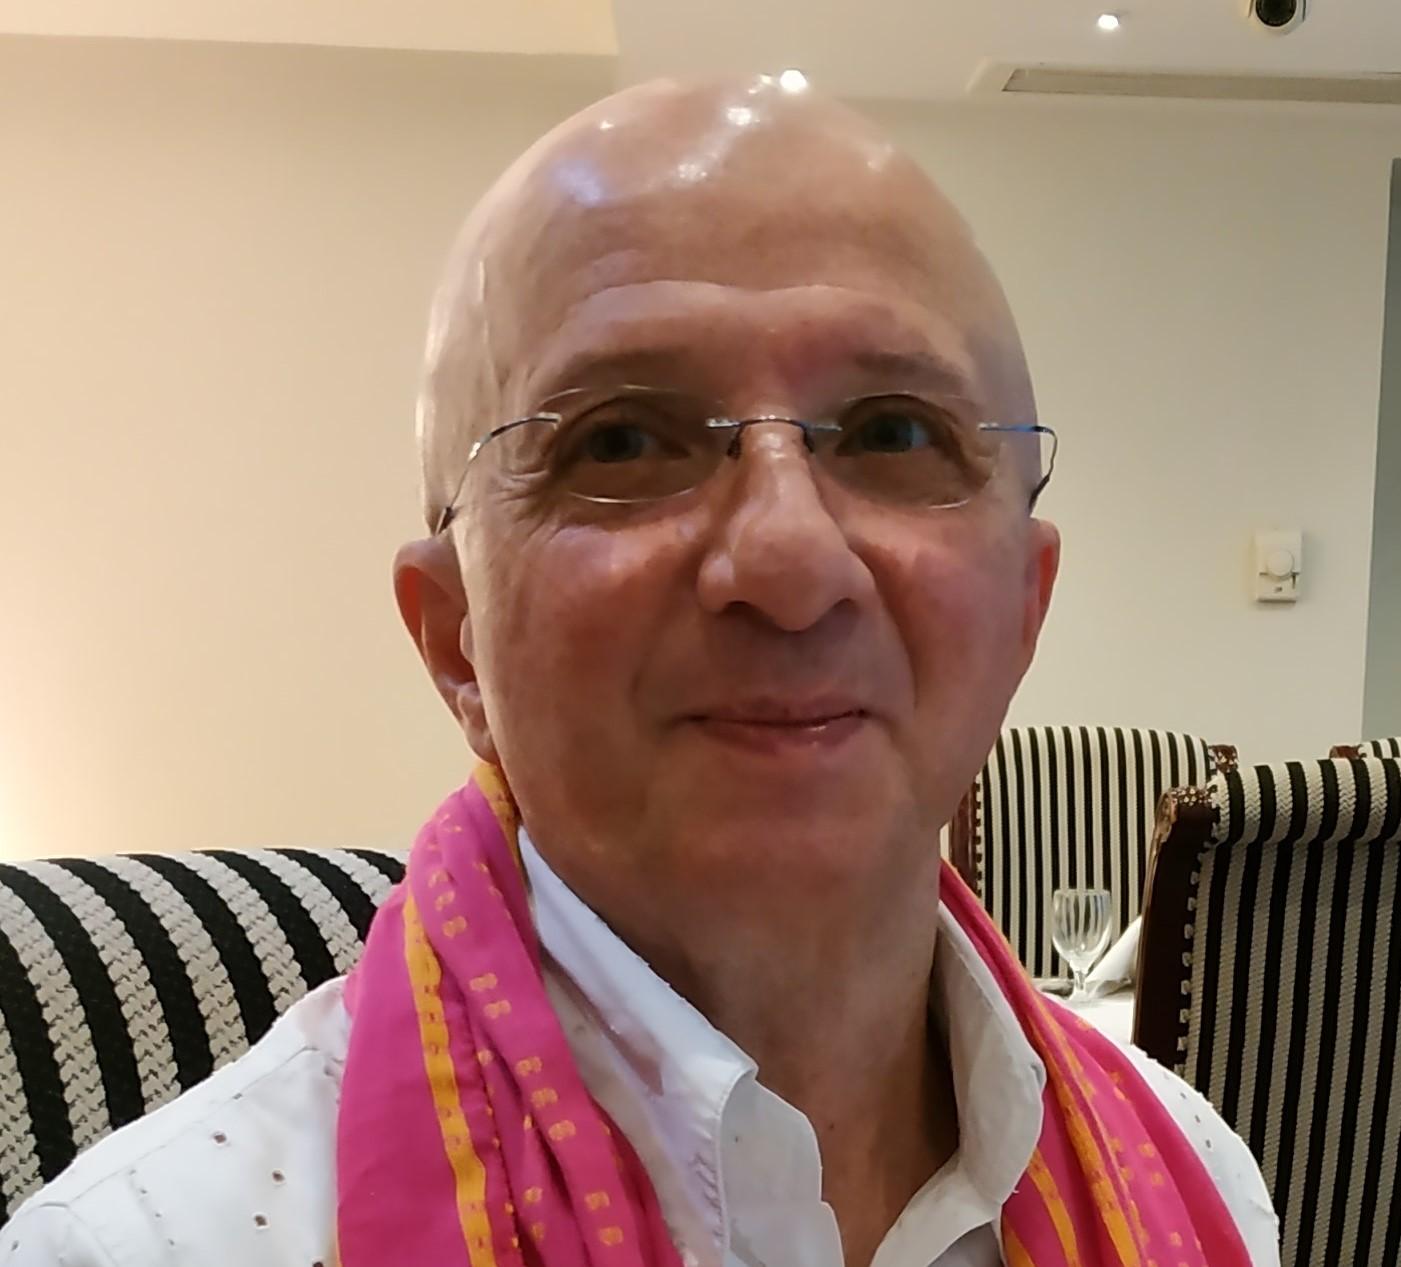 Serge Kostin